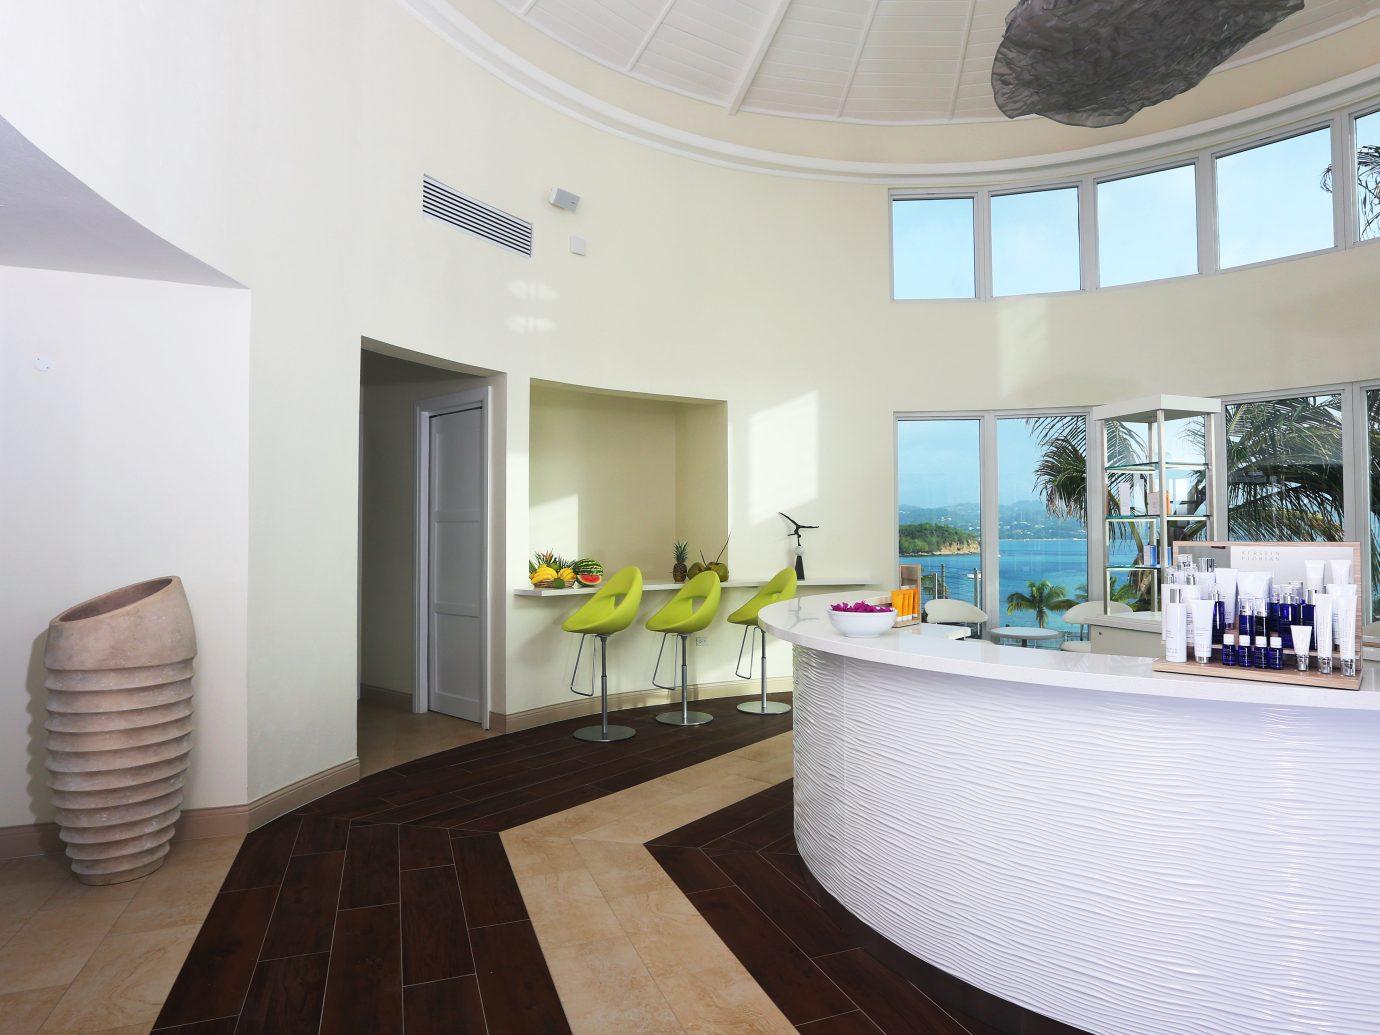 Beachfront Boutique Hotels Island Lobby Tropical indoor floor wall property room ceiling interior design estate real estate condominium home Design apartment furniture